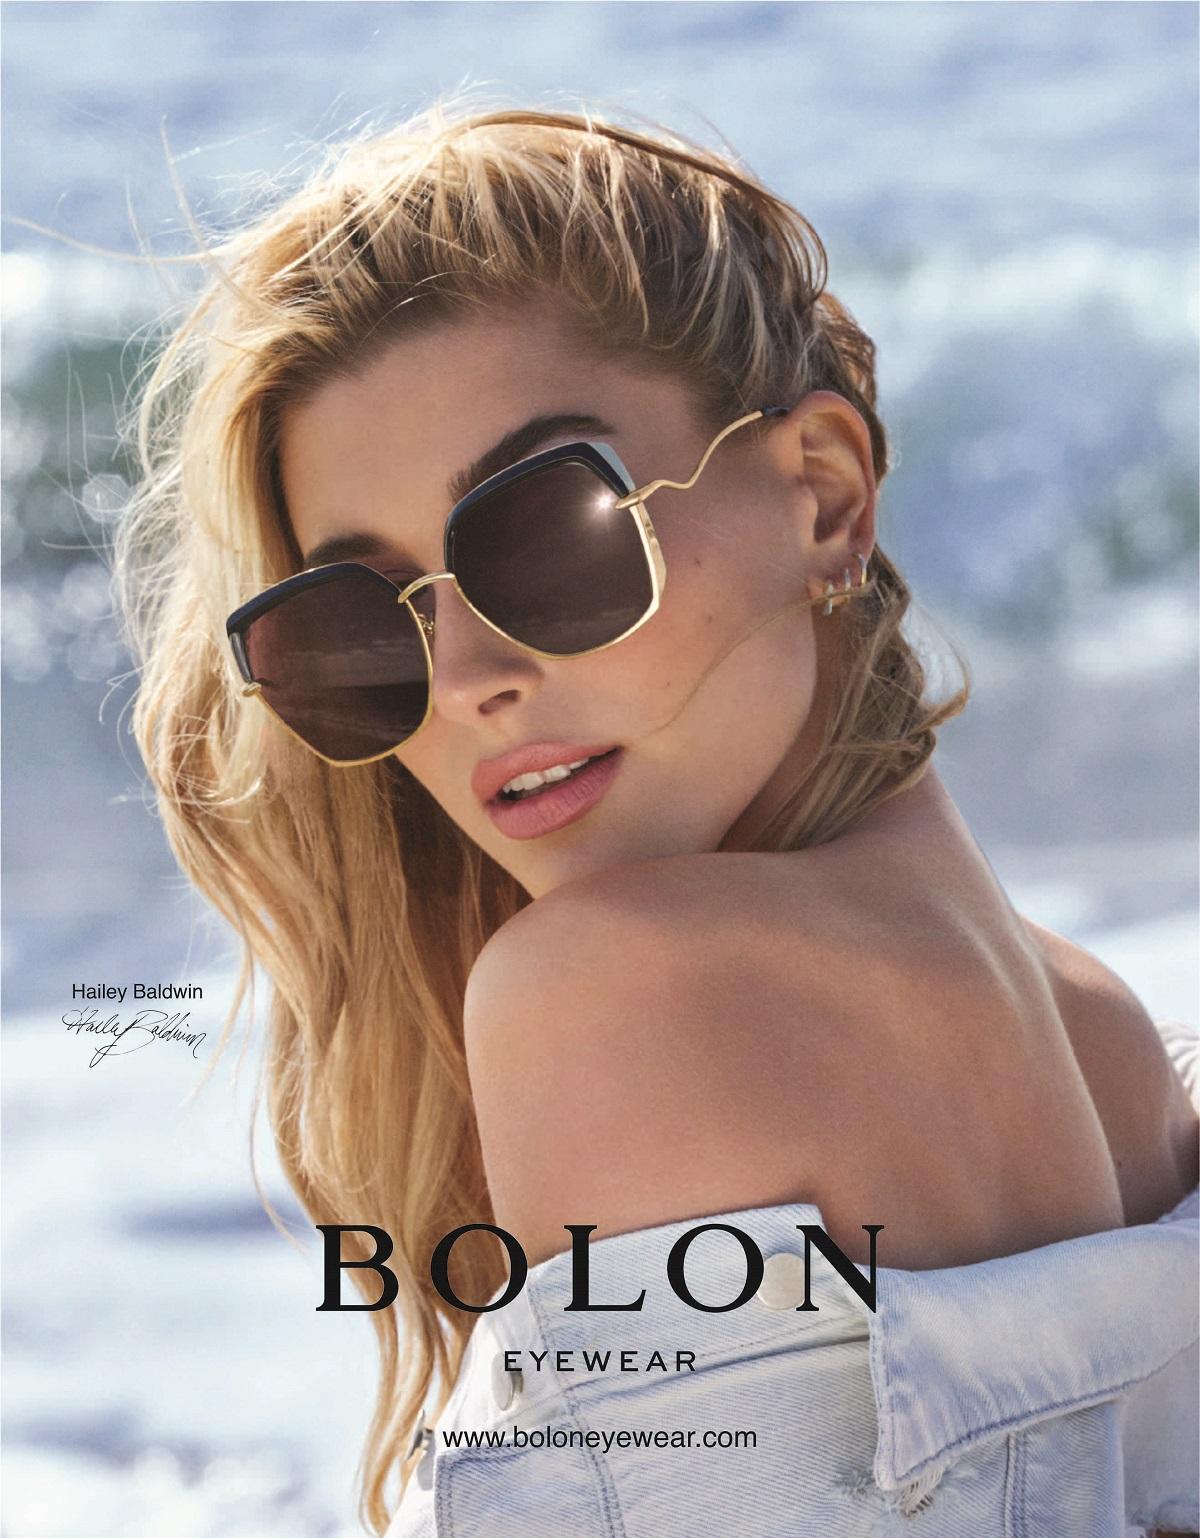 Hailey Baldwin per Bolon Eyewear